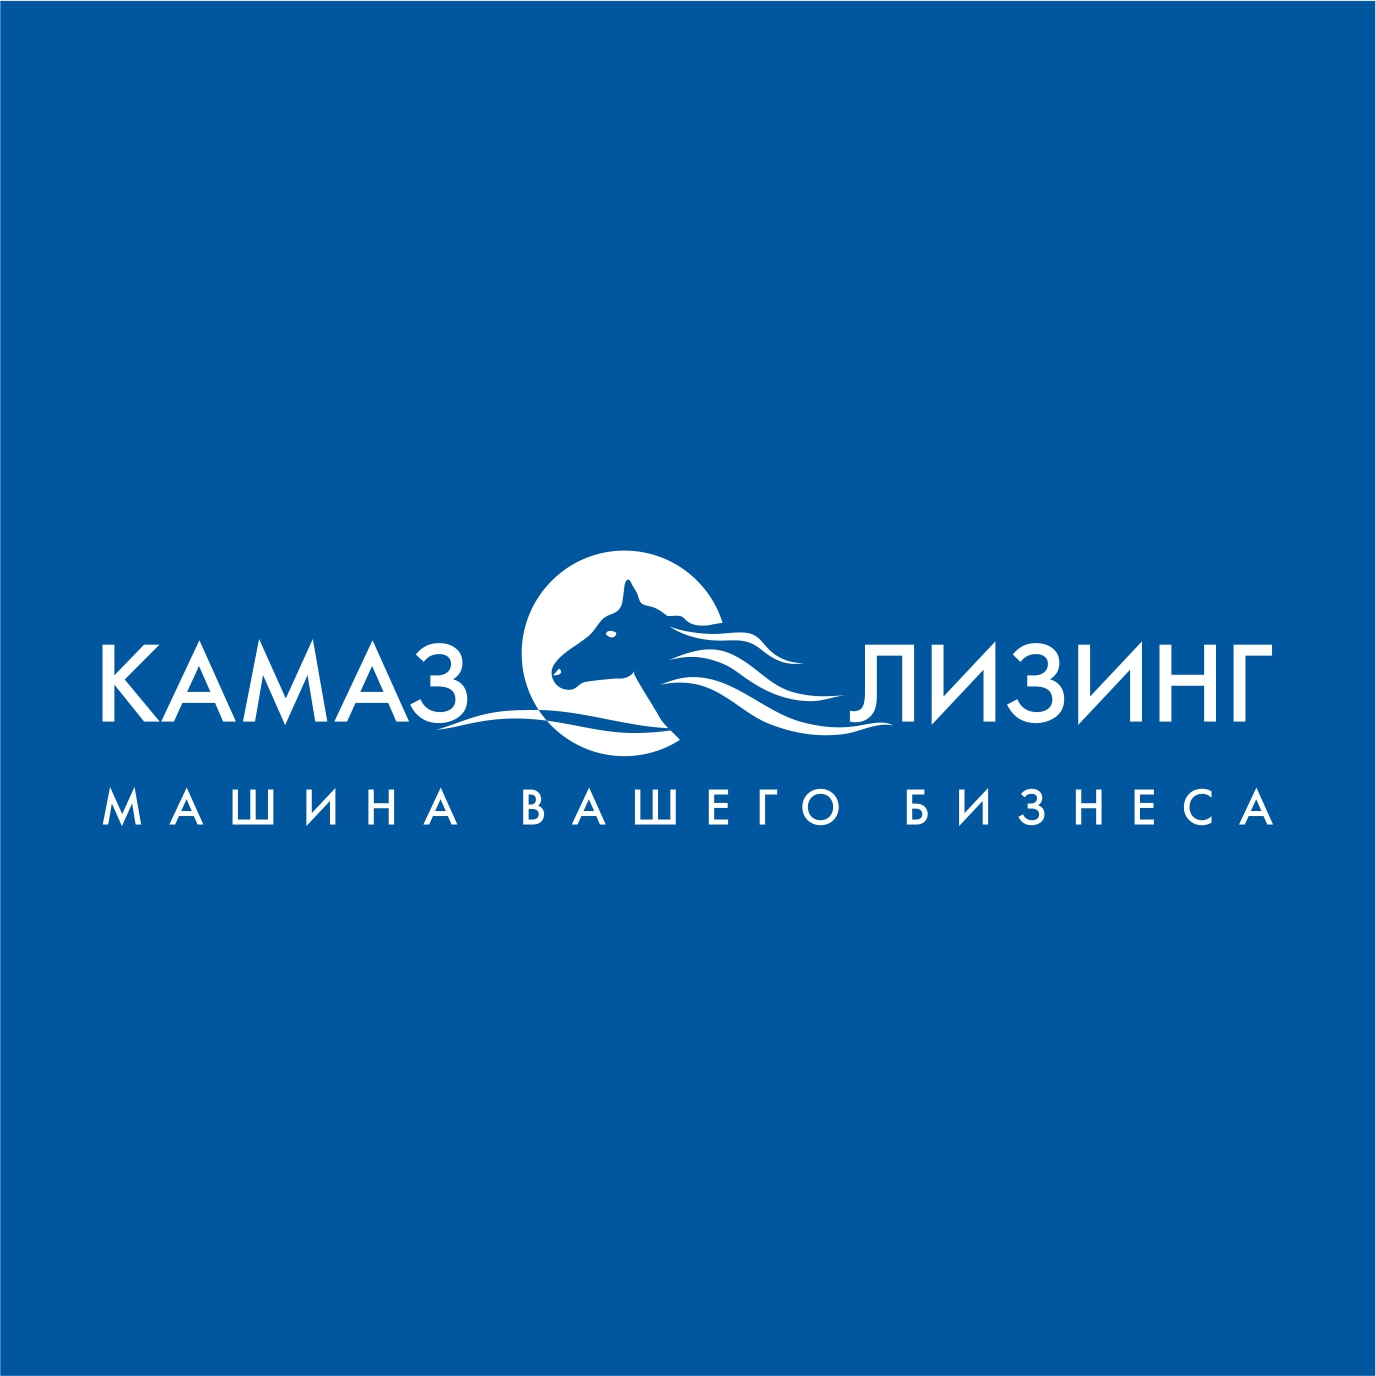 Экспресс-проверка лизингополучателей «КАМАЗ-ЛИЗИНГ»